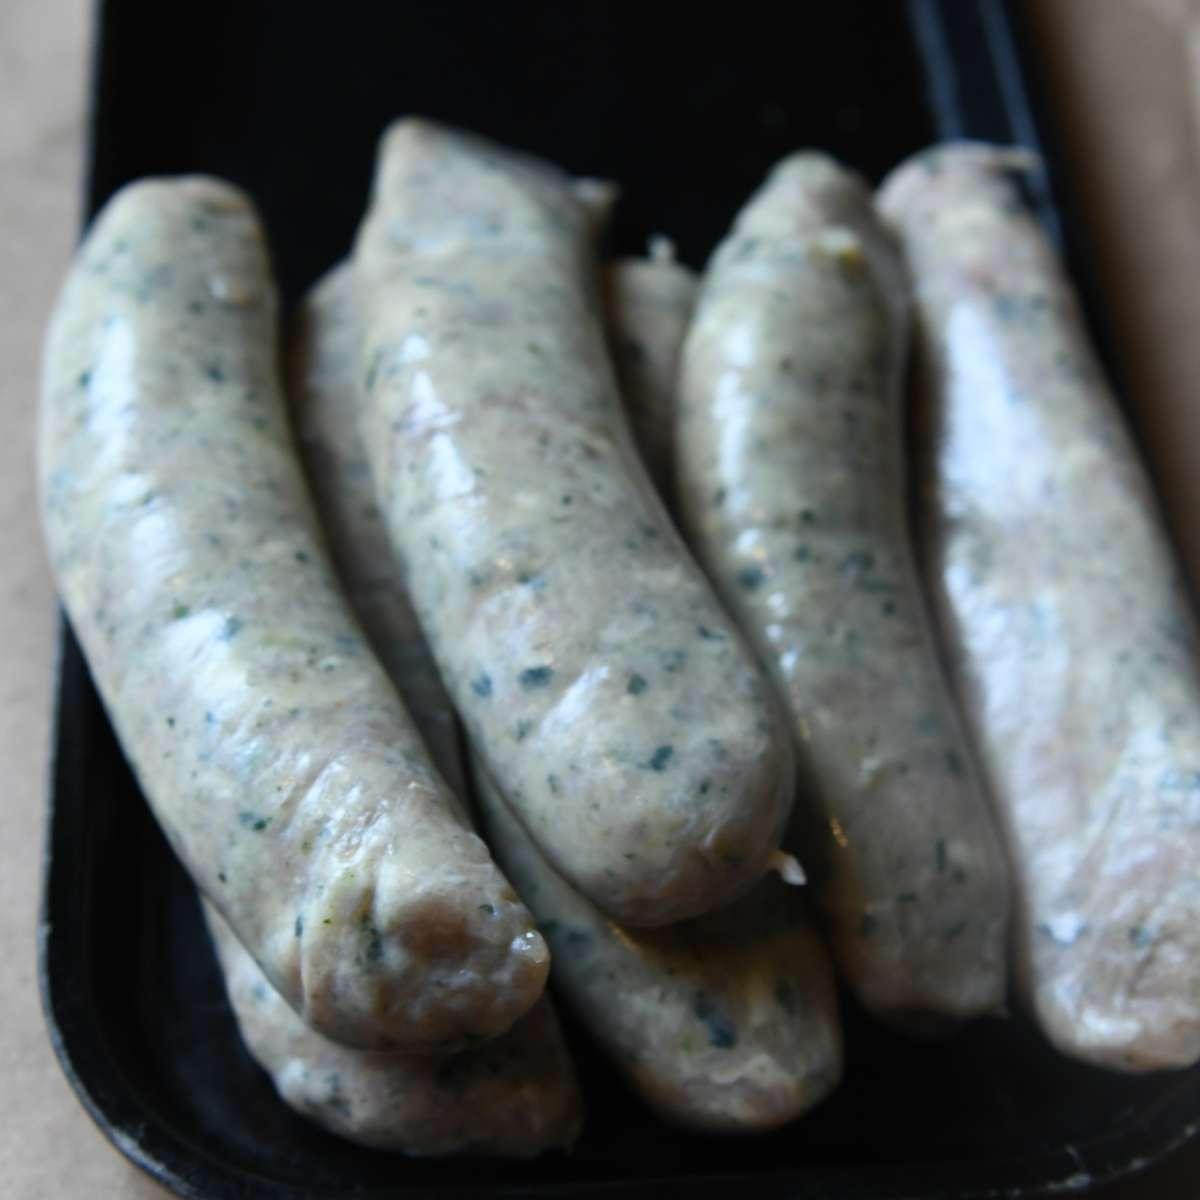 Ash Farms Spinach and Feta Sausage